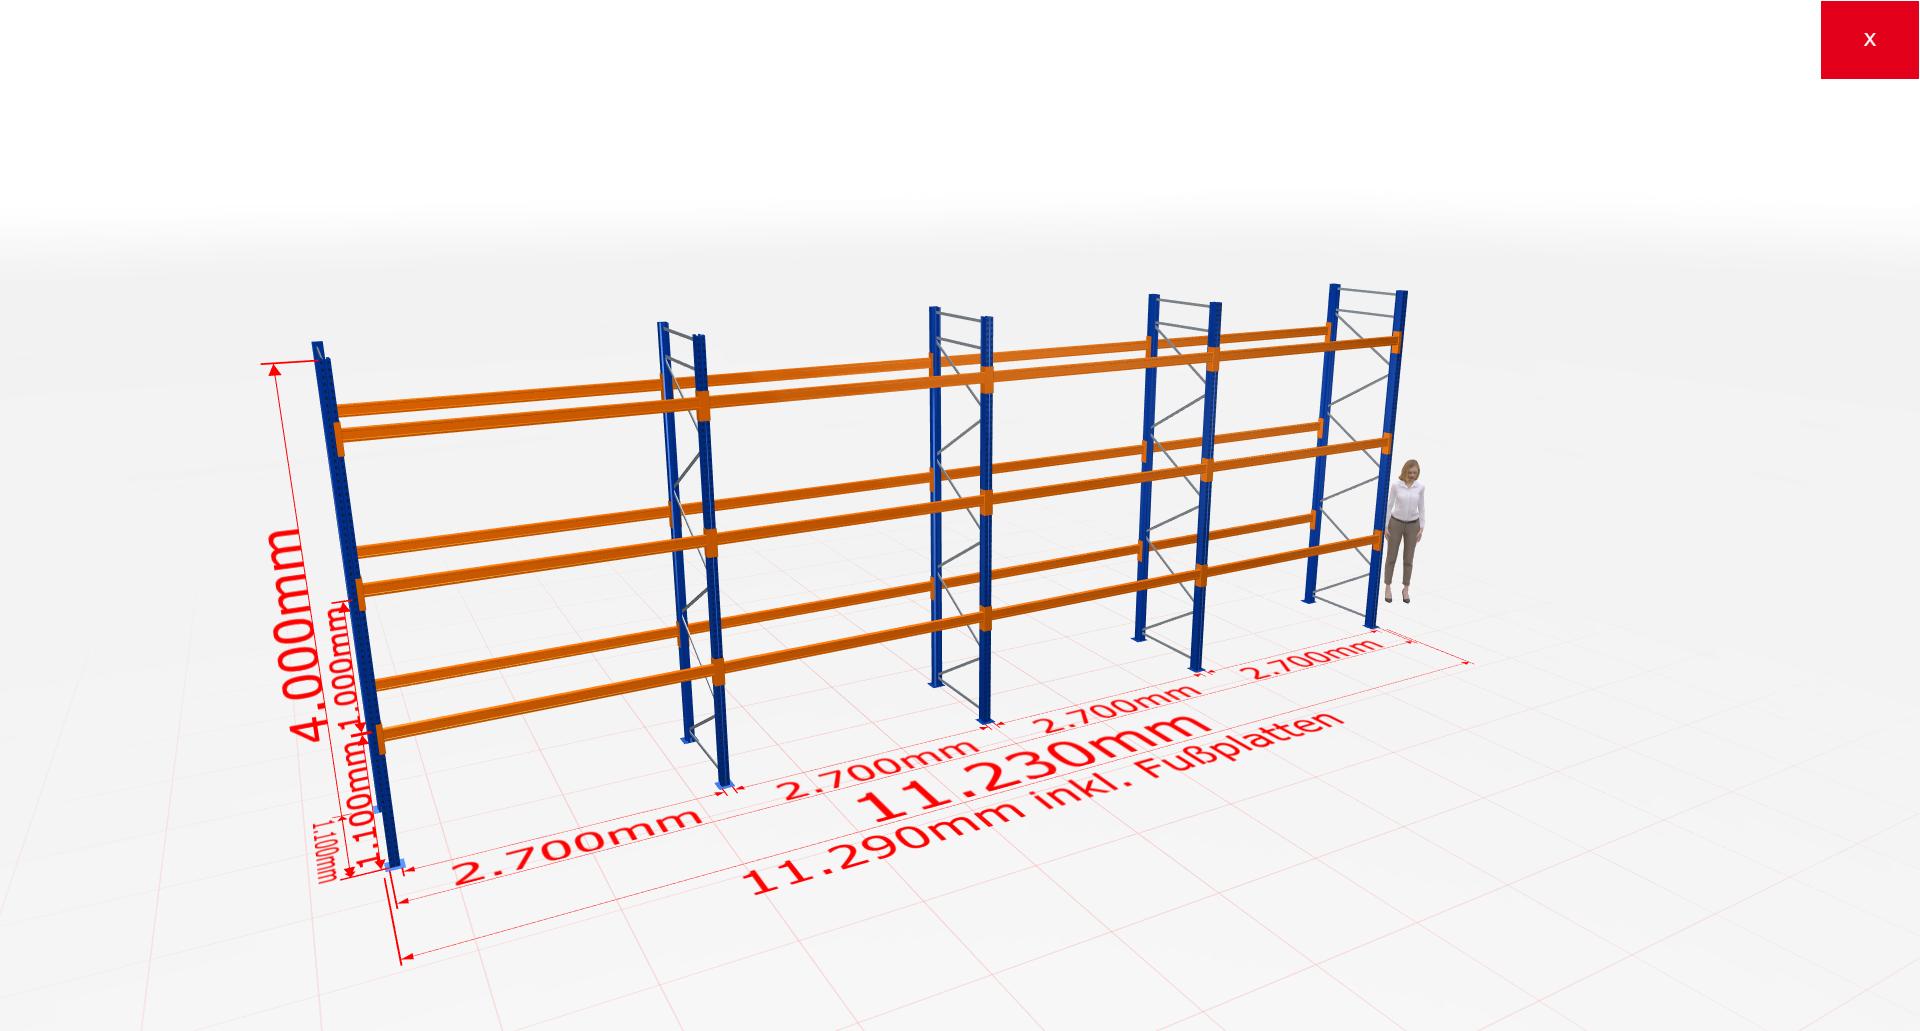 Palettenregal Komplettregal 4000x11230x1100 mm (HxBxT) 3 Fachebenen SCHULTE Lagertechnik